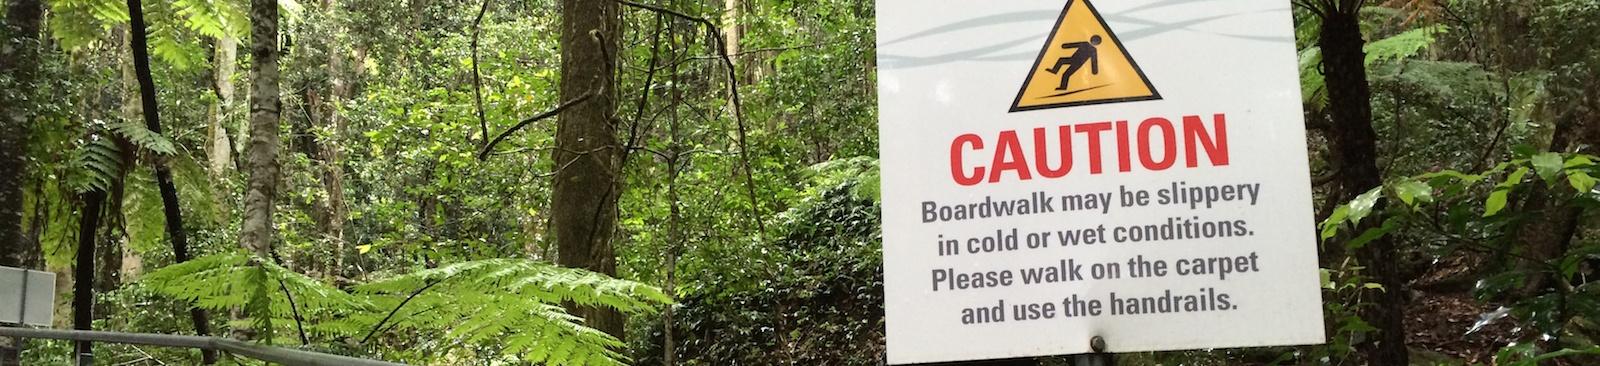 slippery_boardwalk_warning_sign_background.jpg